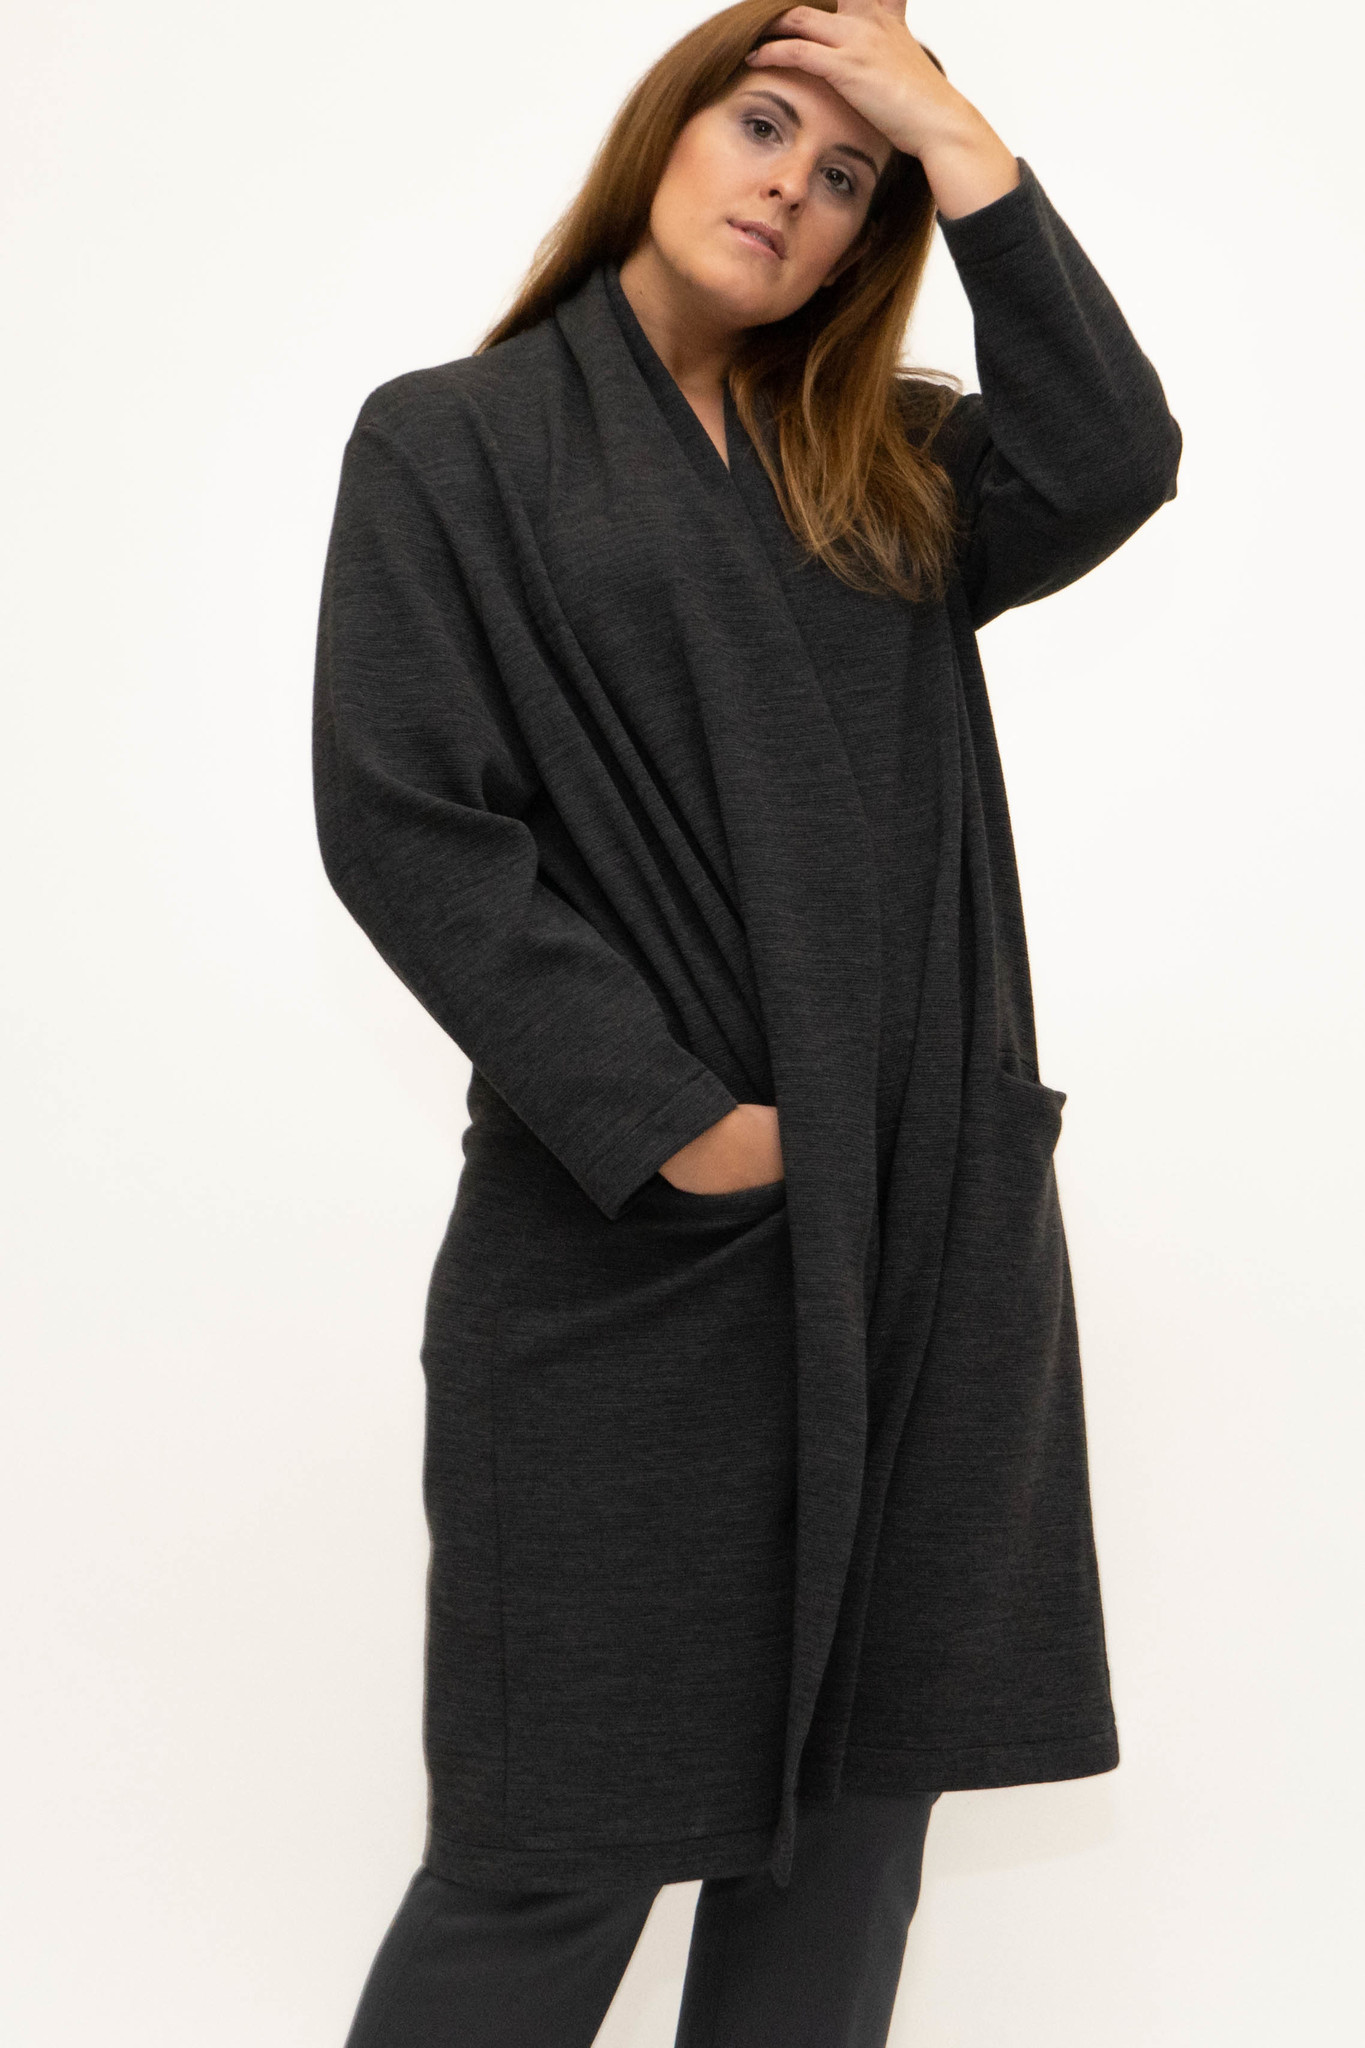 PHILIA Cardigan in Polyester-Virgin Wool blend-1